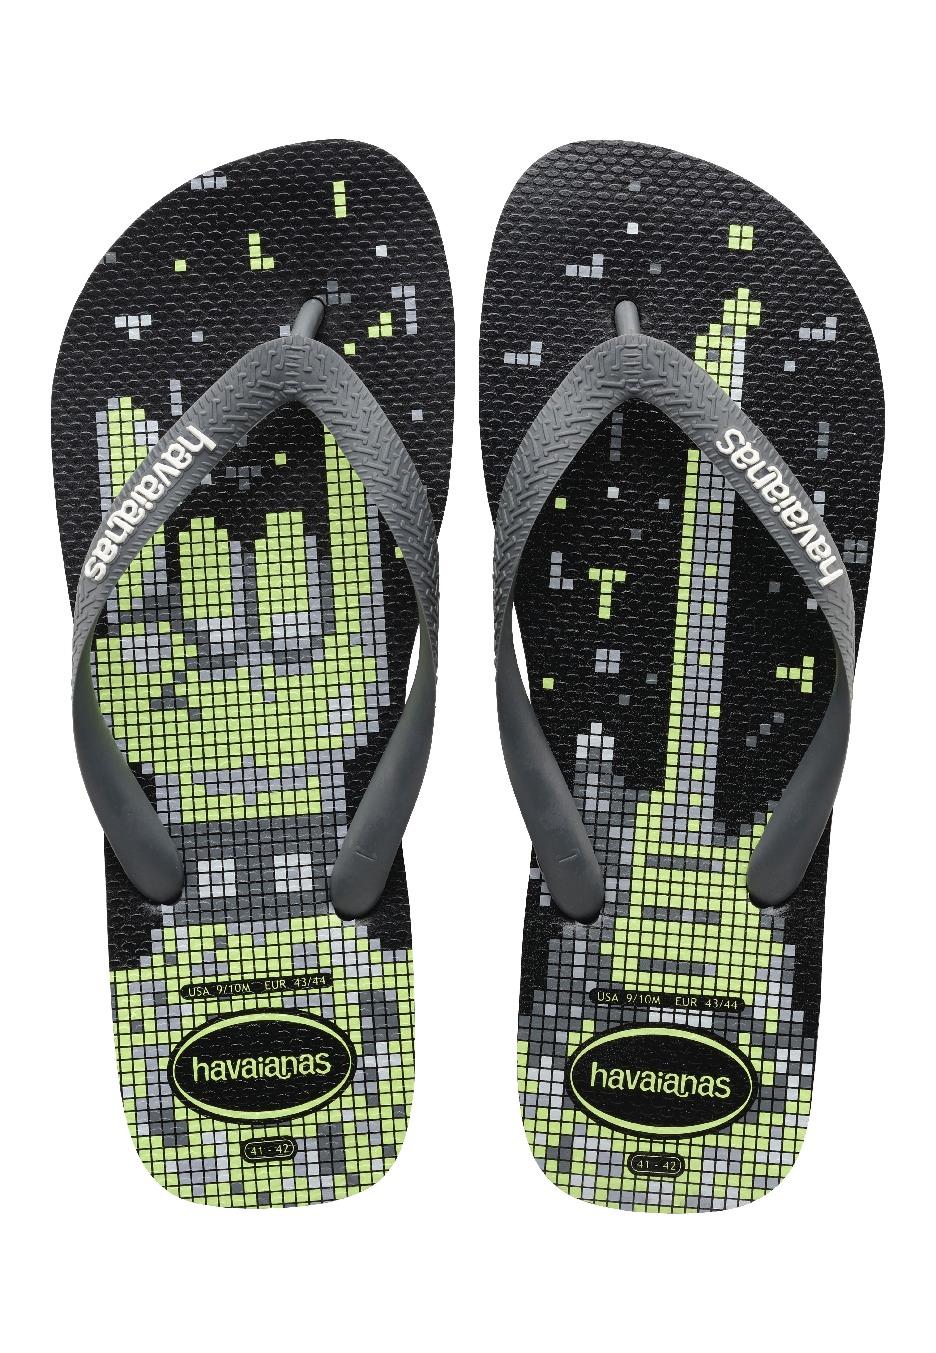 0bbe845d5083 Havaianas - 4 Nite Black Grey White - Sandals - Streetwear Shop -  Impericon.com UK